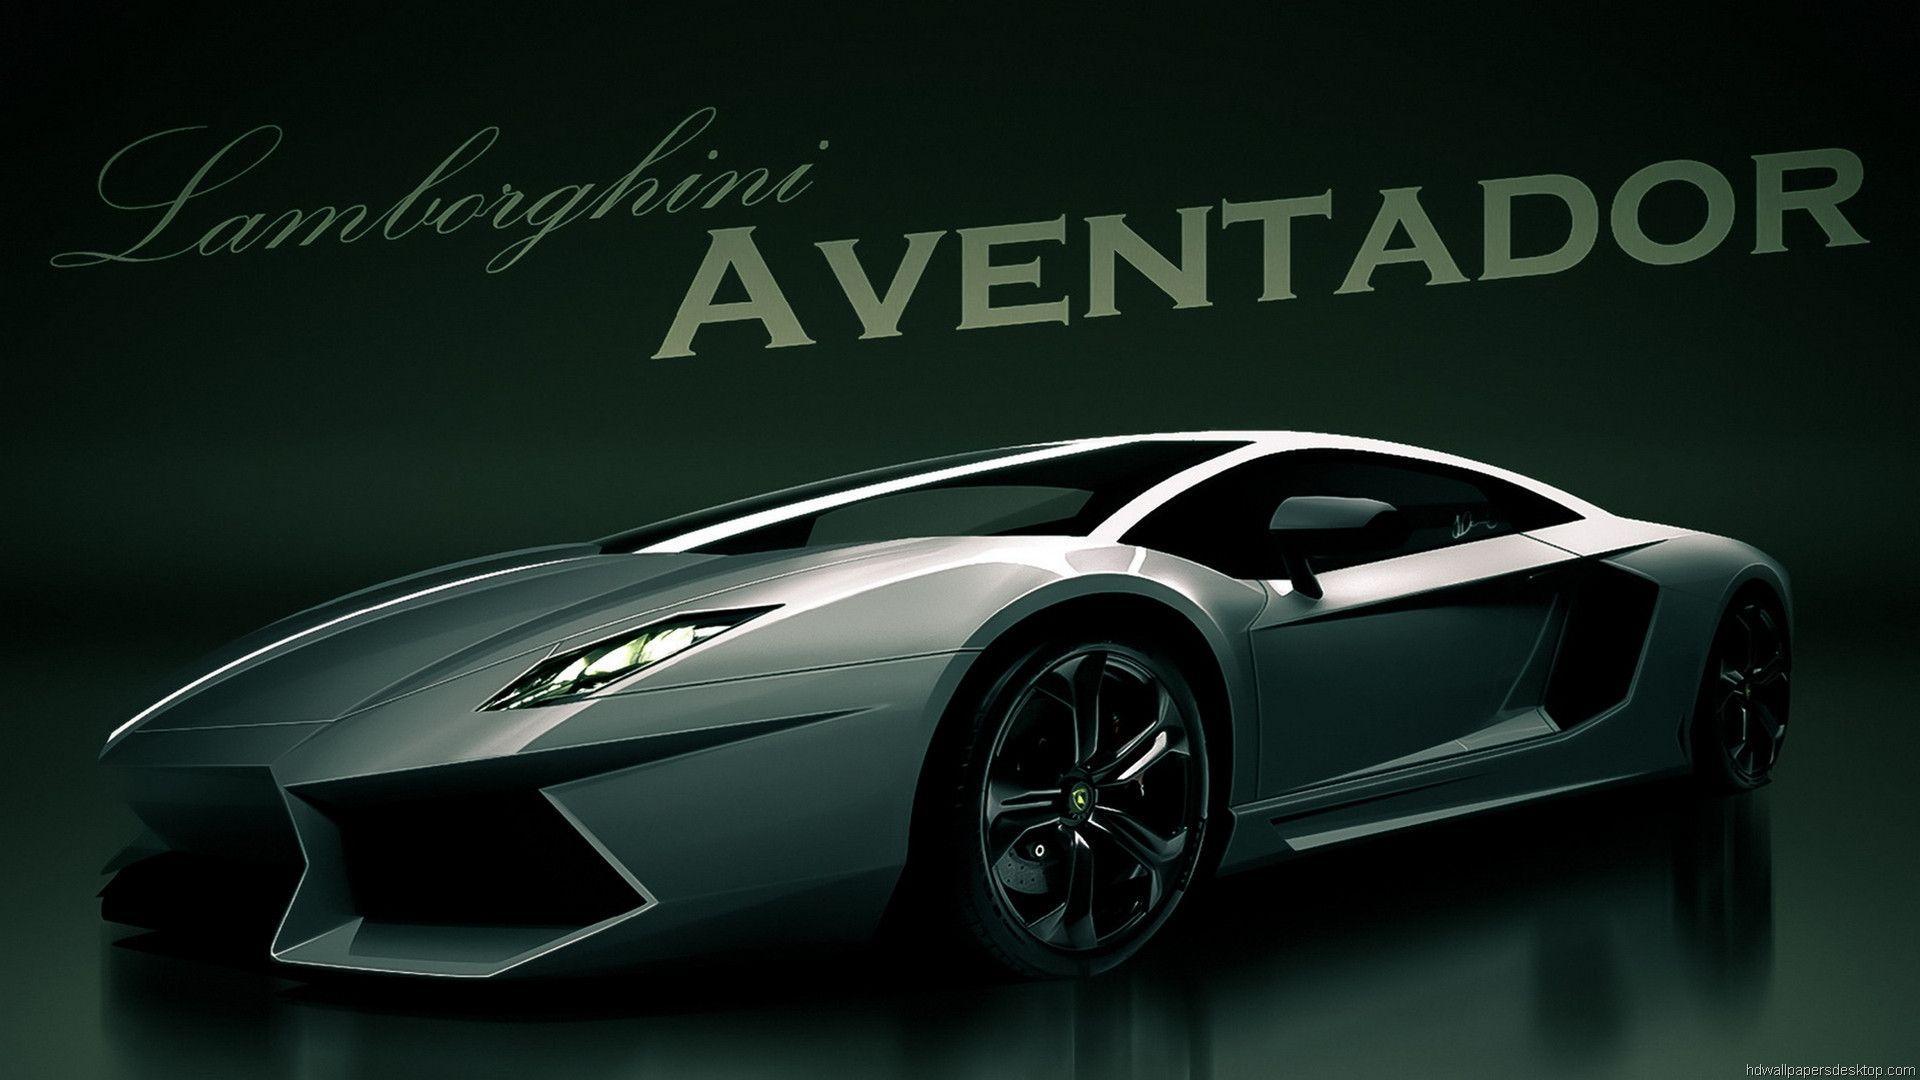 wallpaper lamborghini aventador hd widescreen 10 hd wallpapers - Tron Lamborghini Aventador Wallpaper